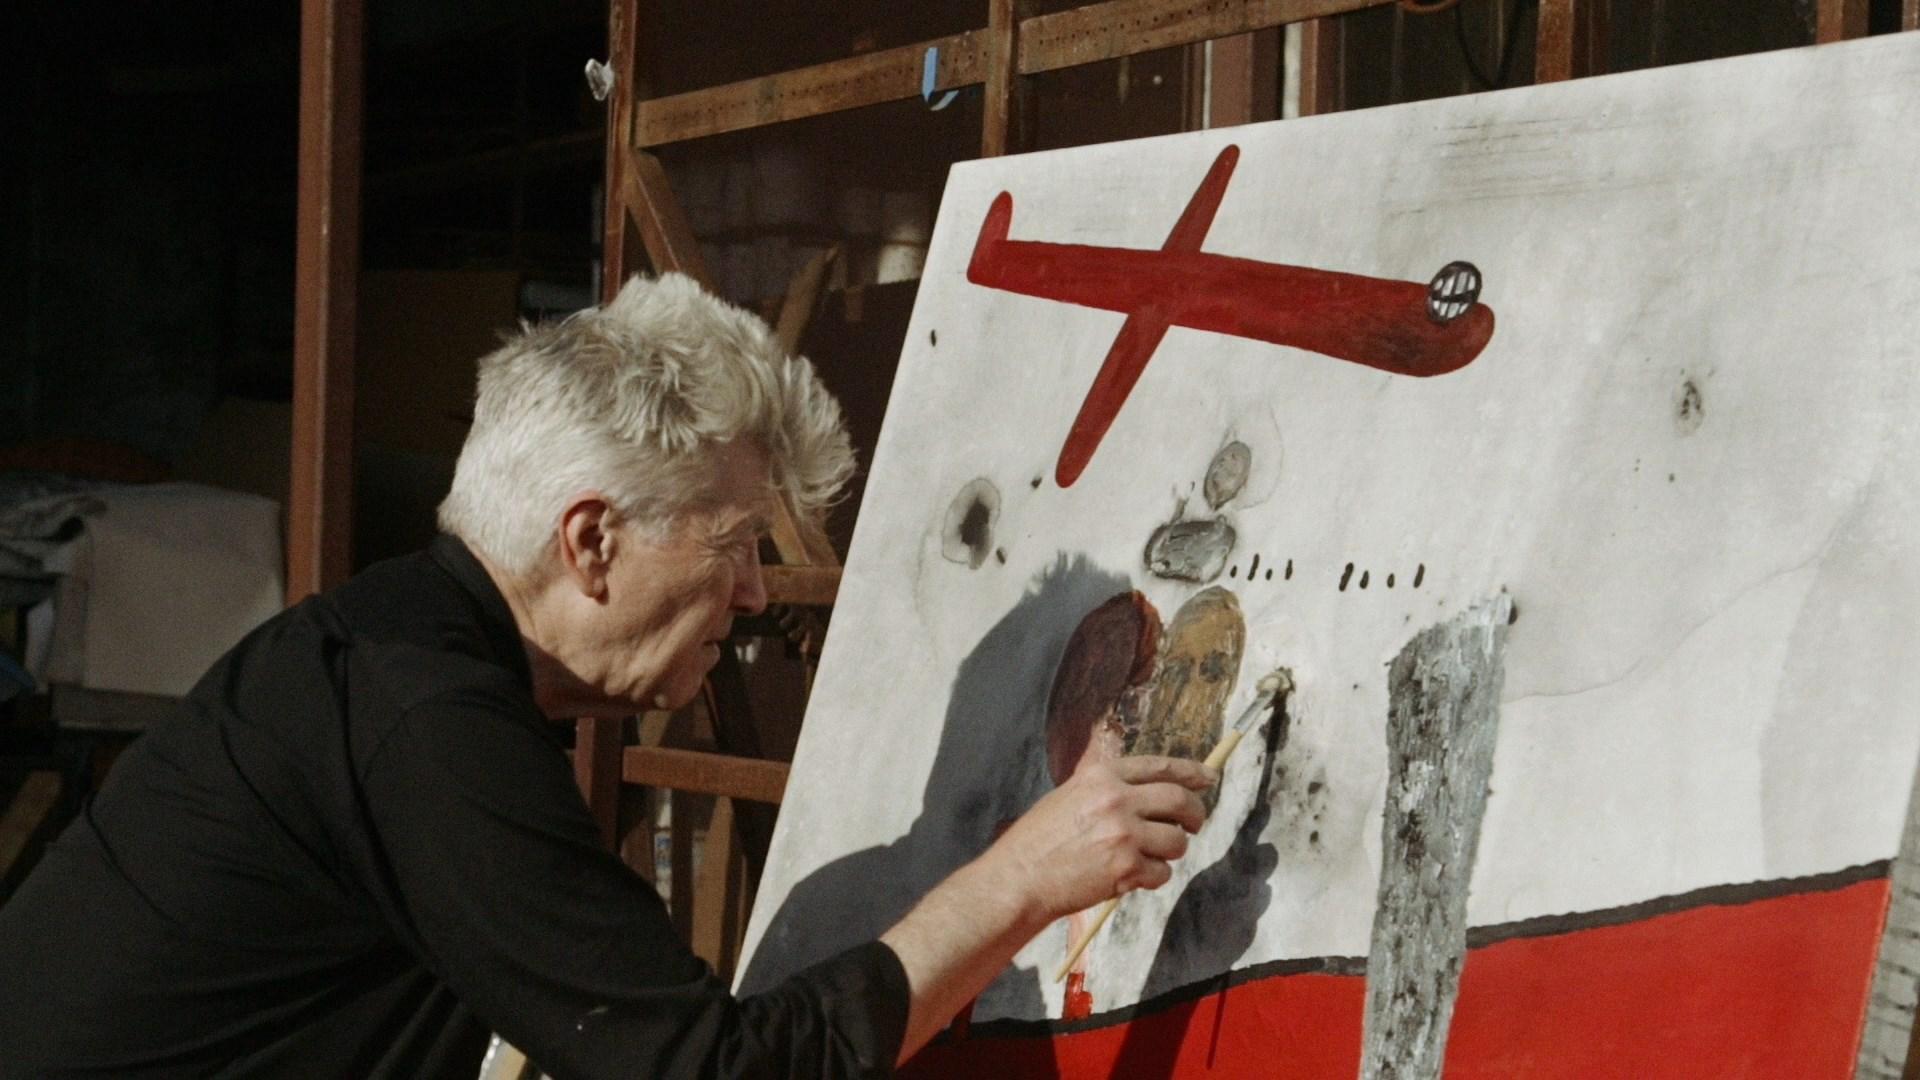 David Lynch The Art Life - Painting